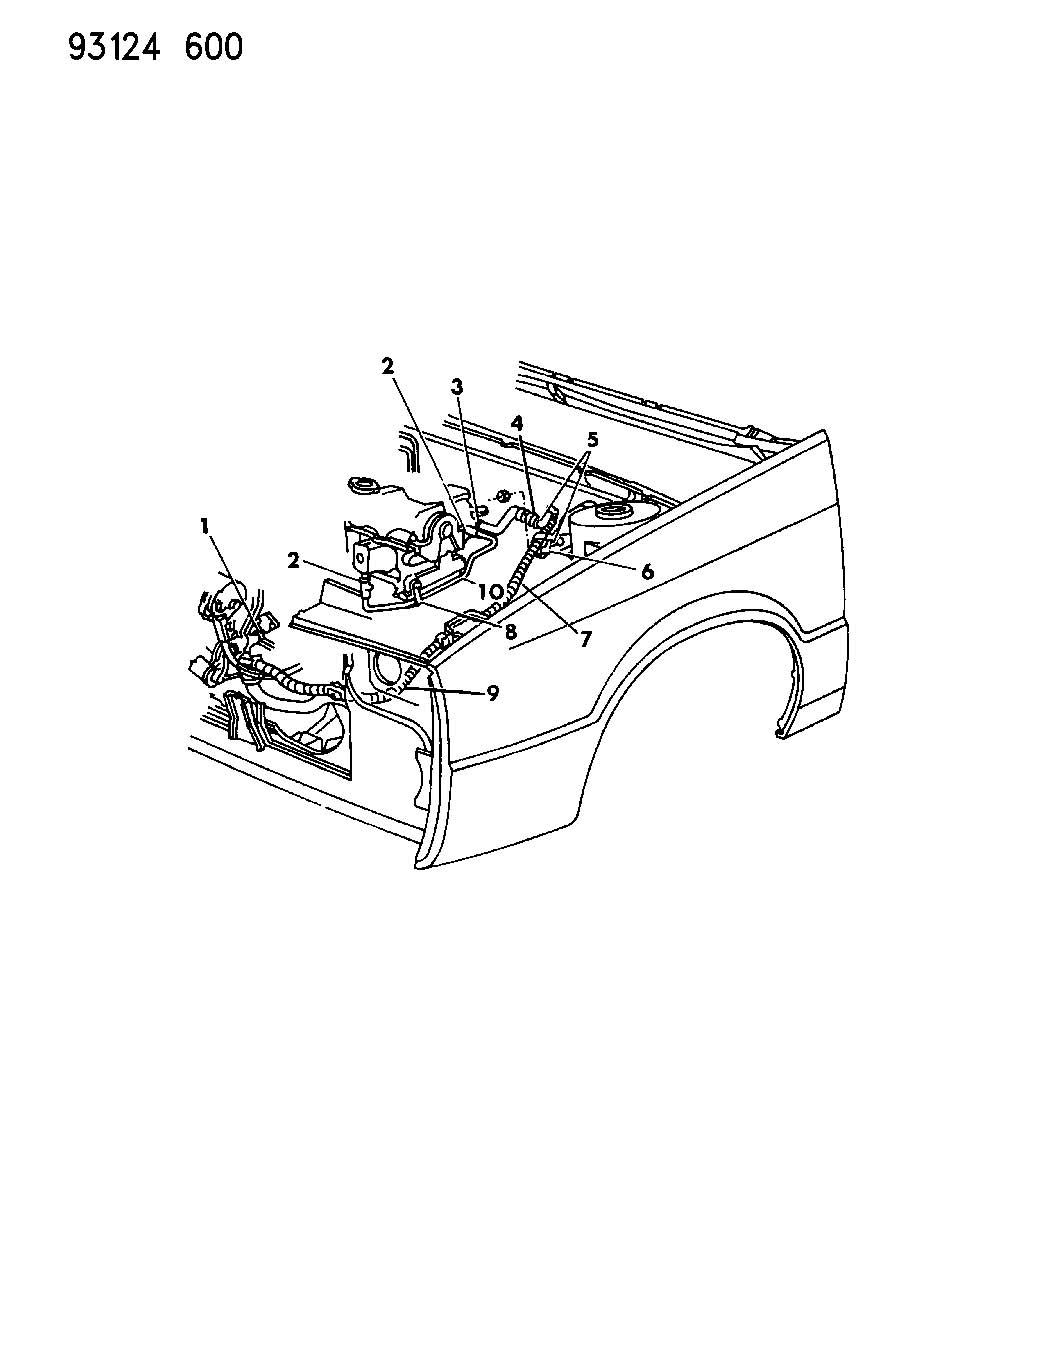 Dodge Caliber Clamp Hose 29x15 Illustrations Sbody